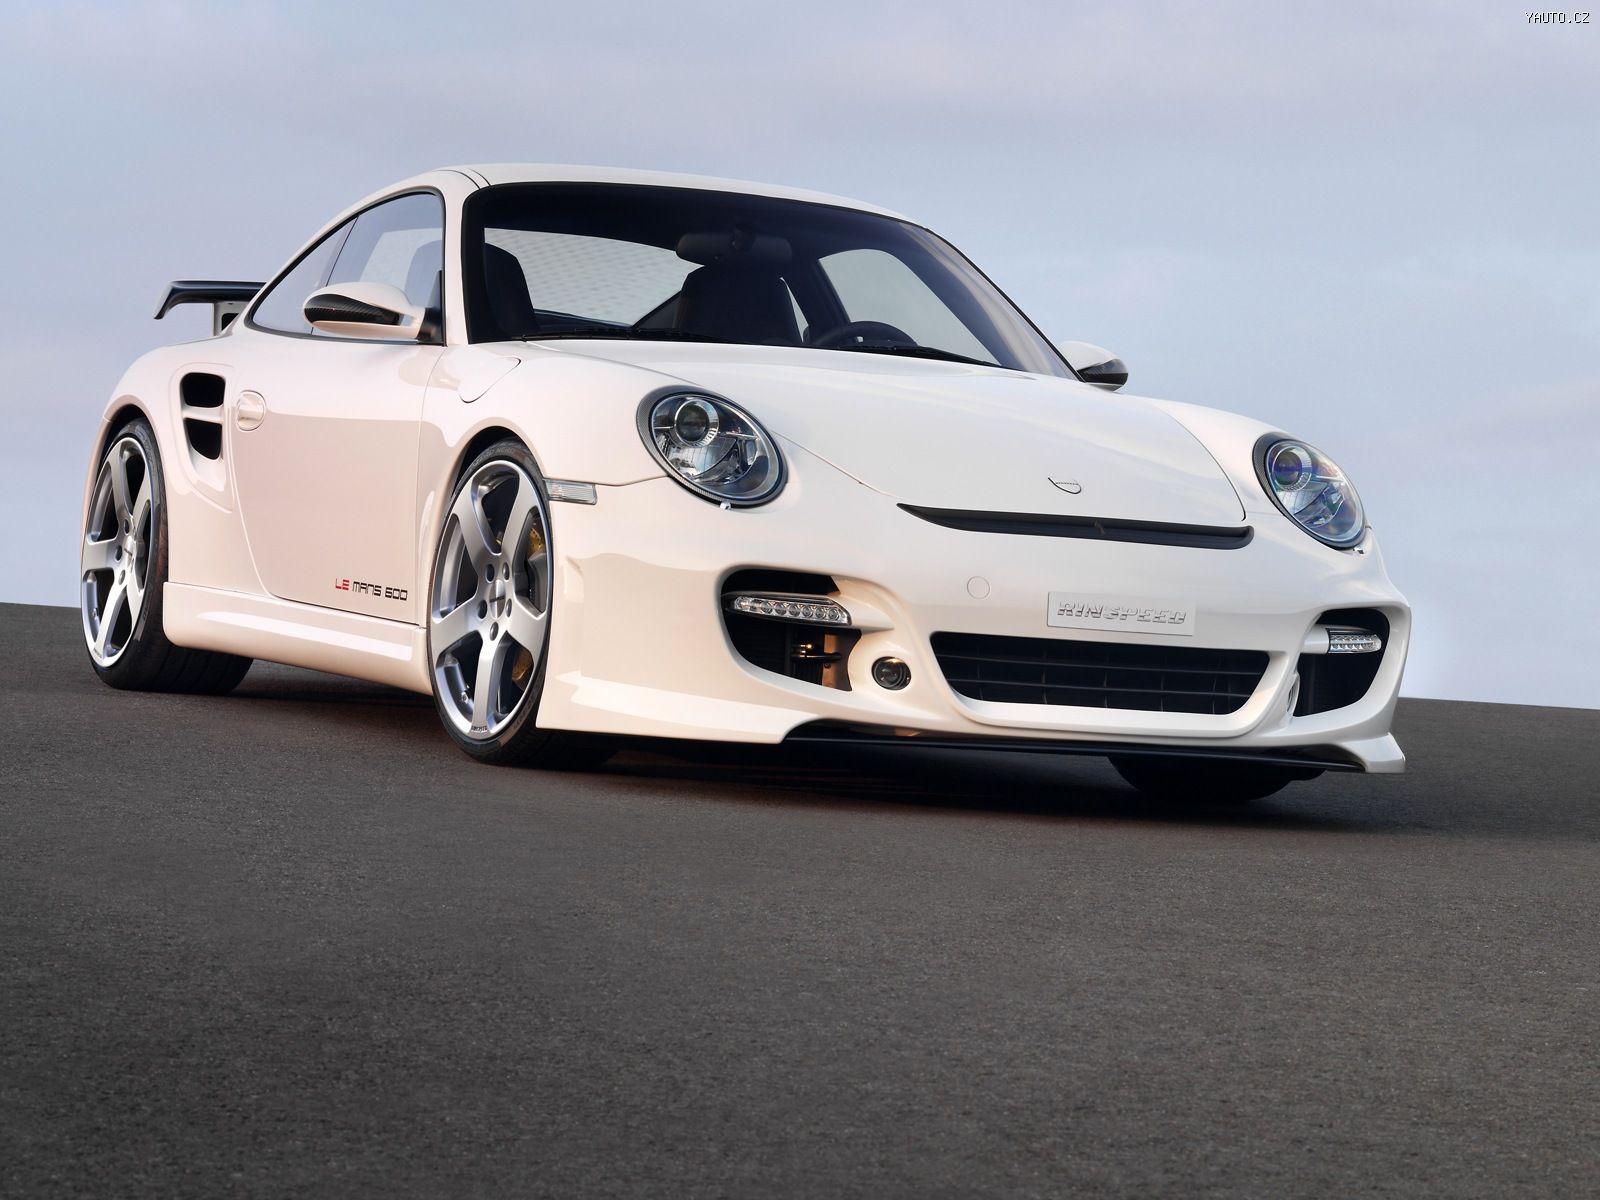 http://img.yauto.cz/tapety/Porsche_911_Turbo_LeMans_4.jpg